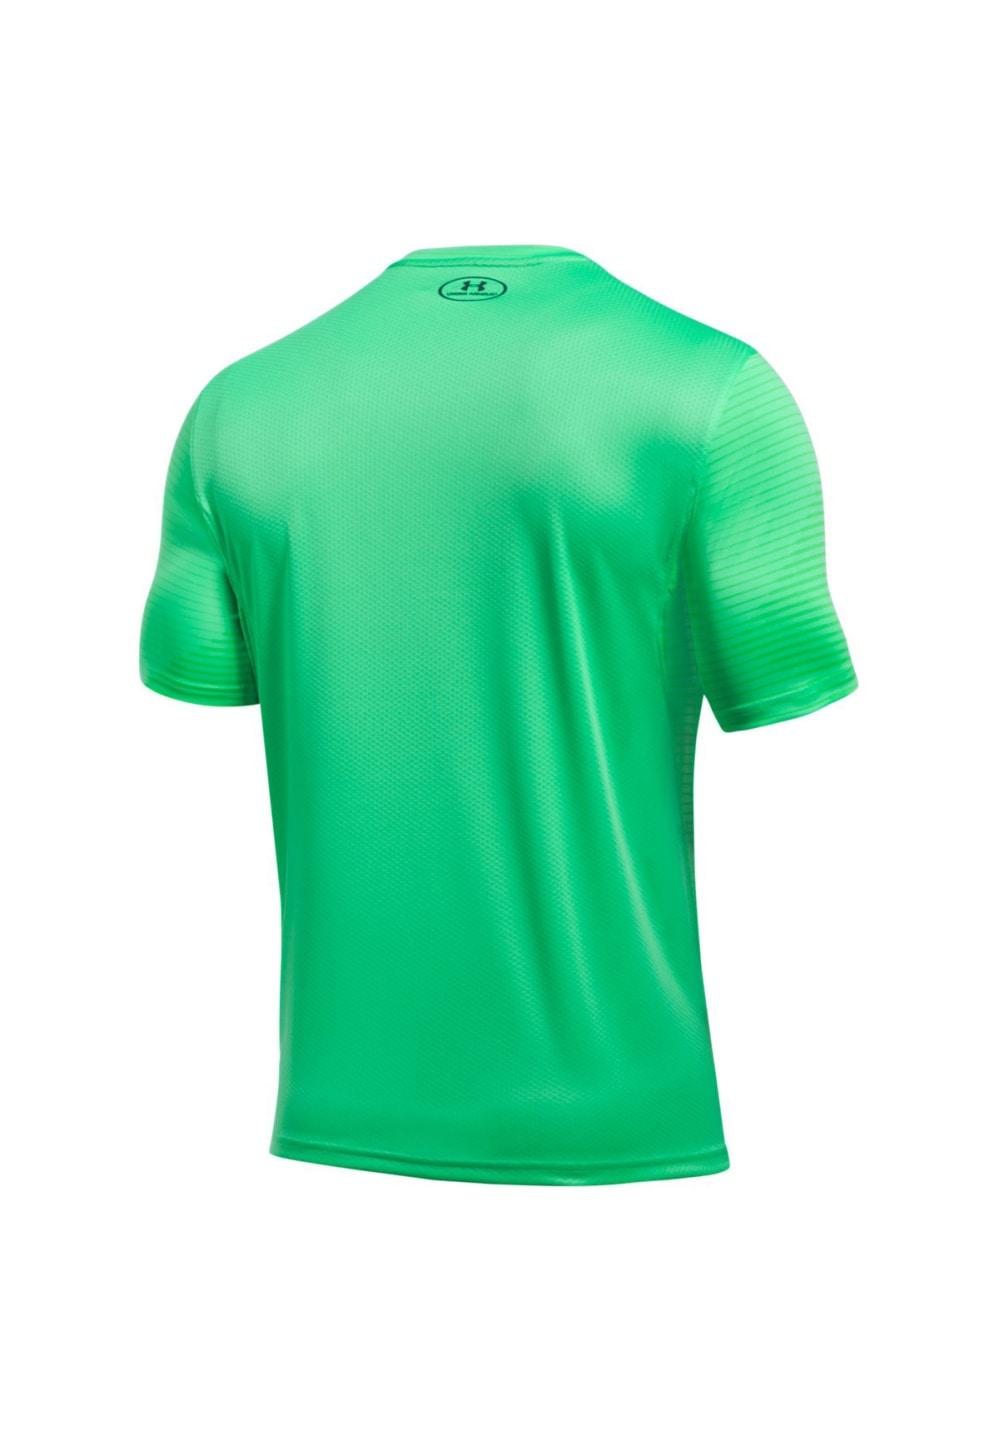 845899da85 Under Armour Challenger II Printed Train Tee - Running tops for Men - Green